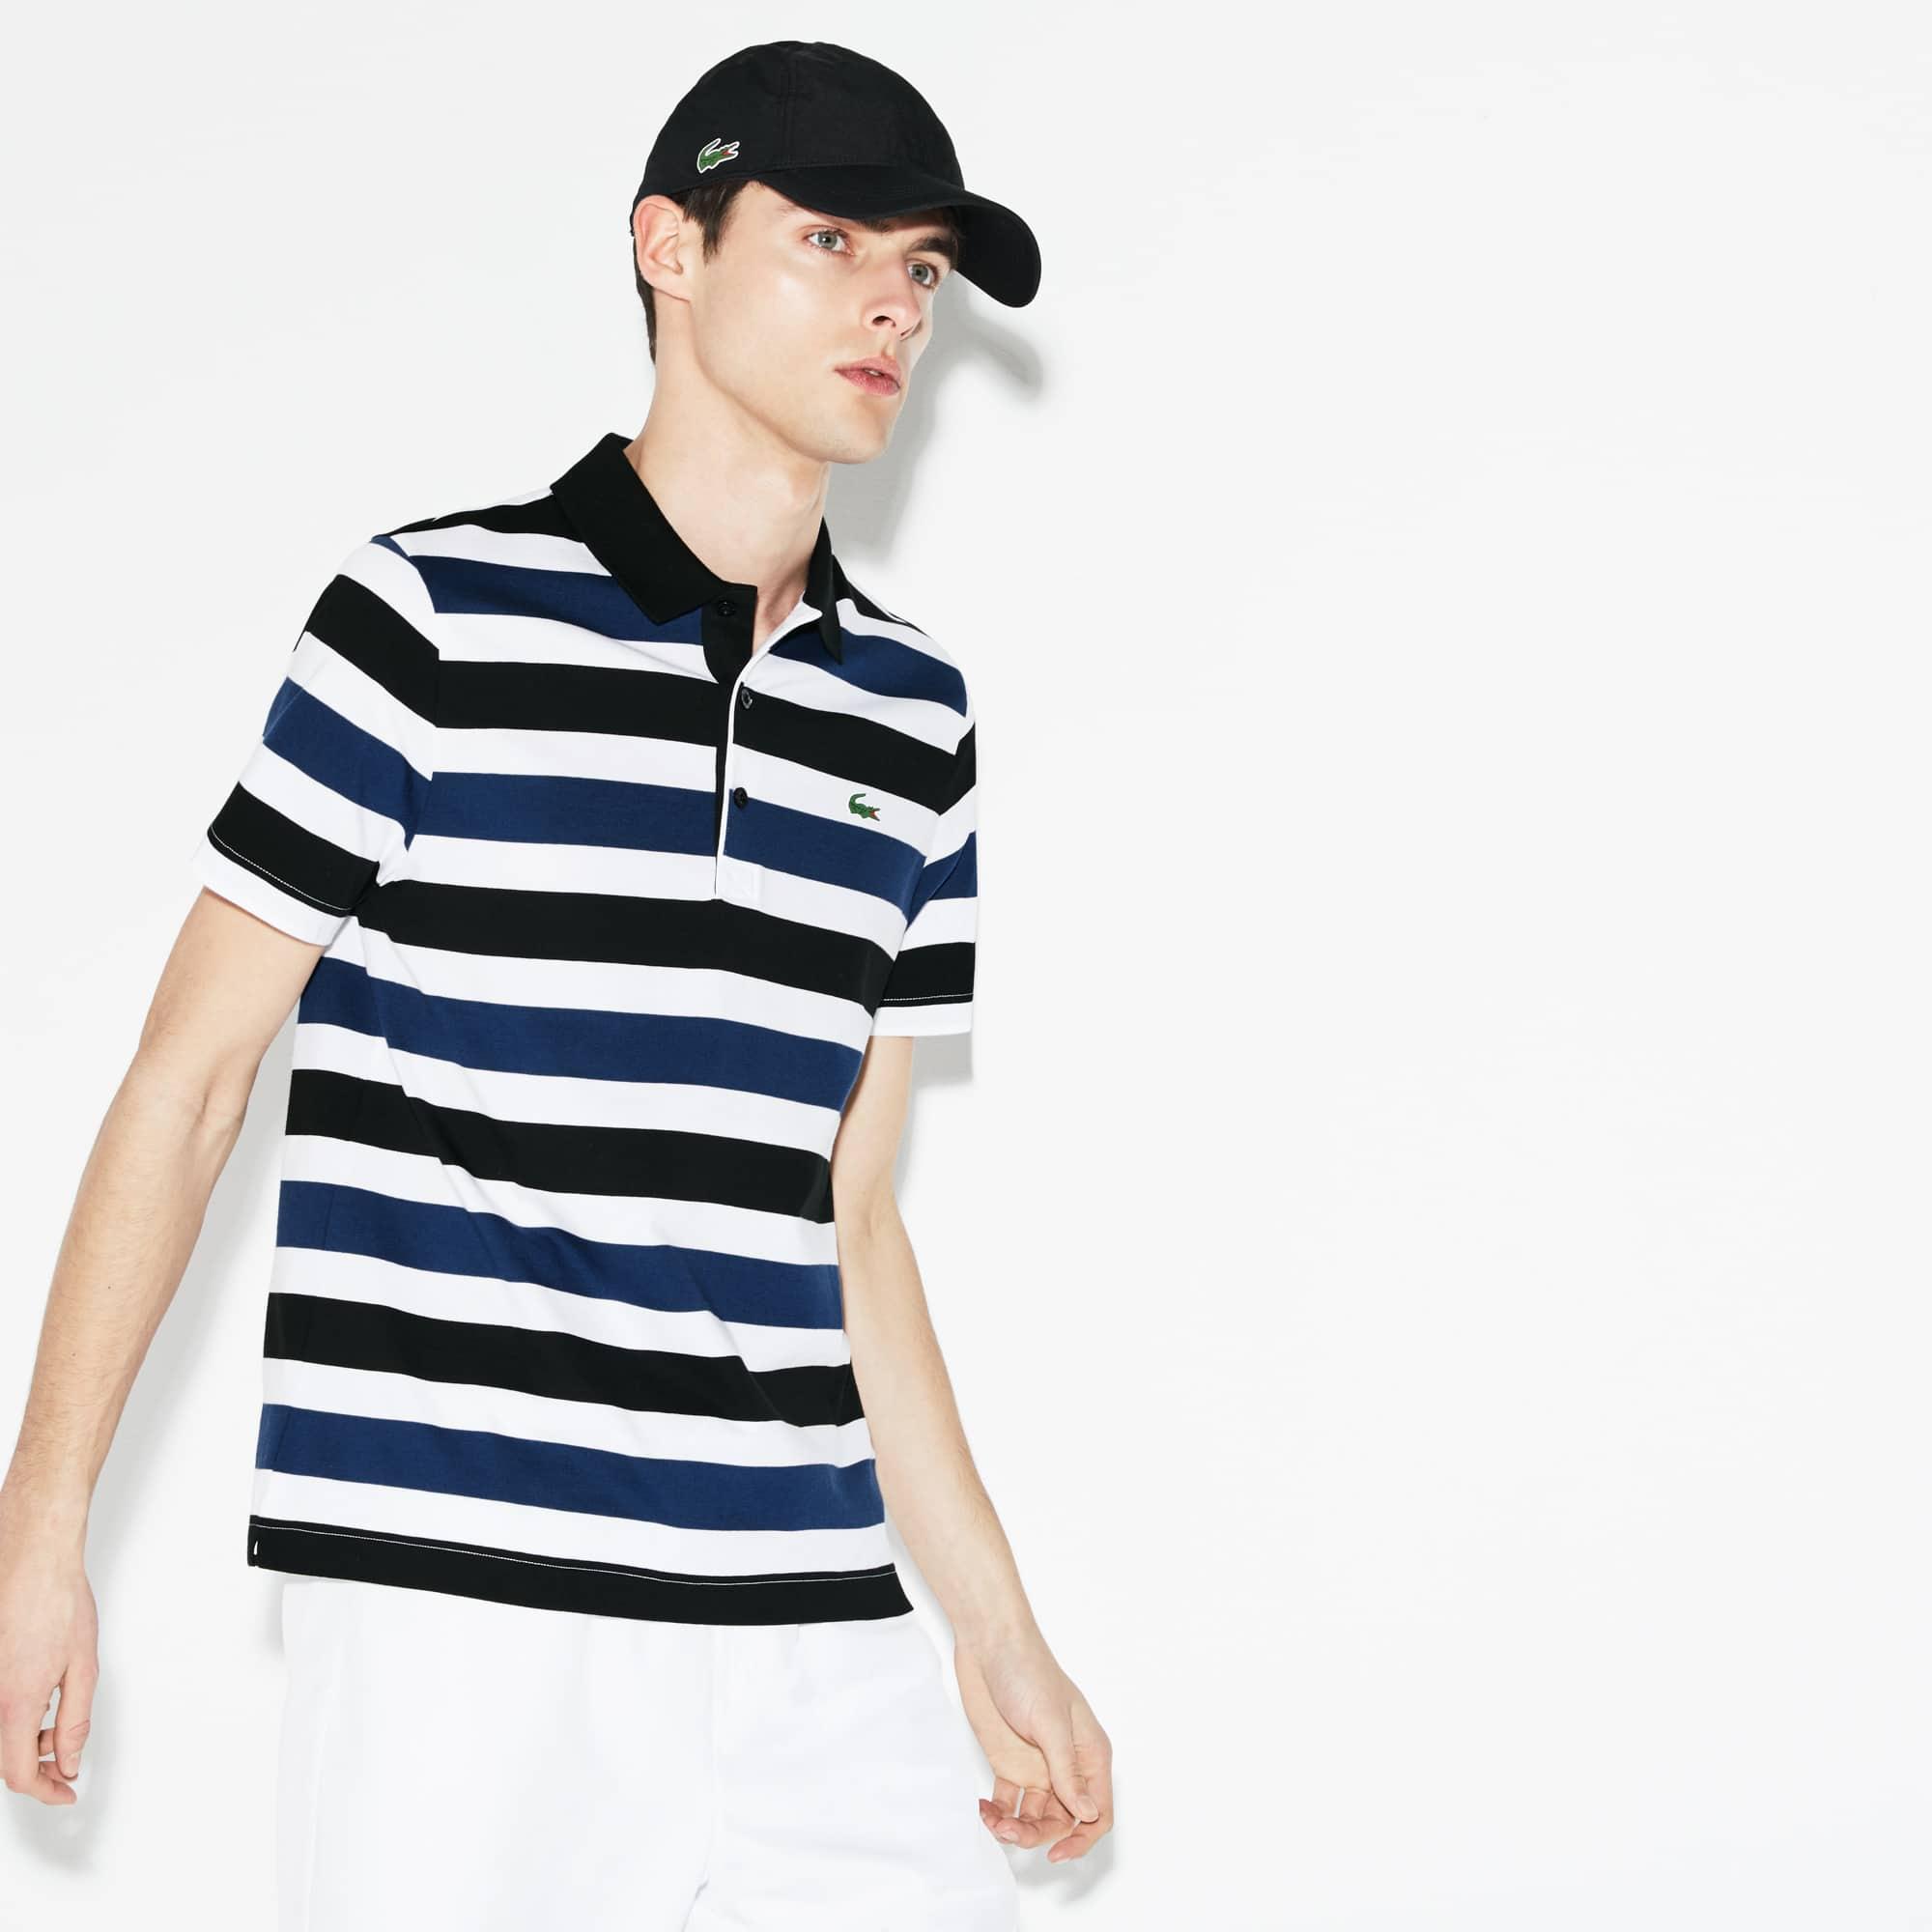 Men's Lacoste SPORT Striped Cotton Jersey Tennis Polo Shirt